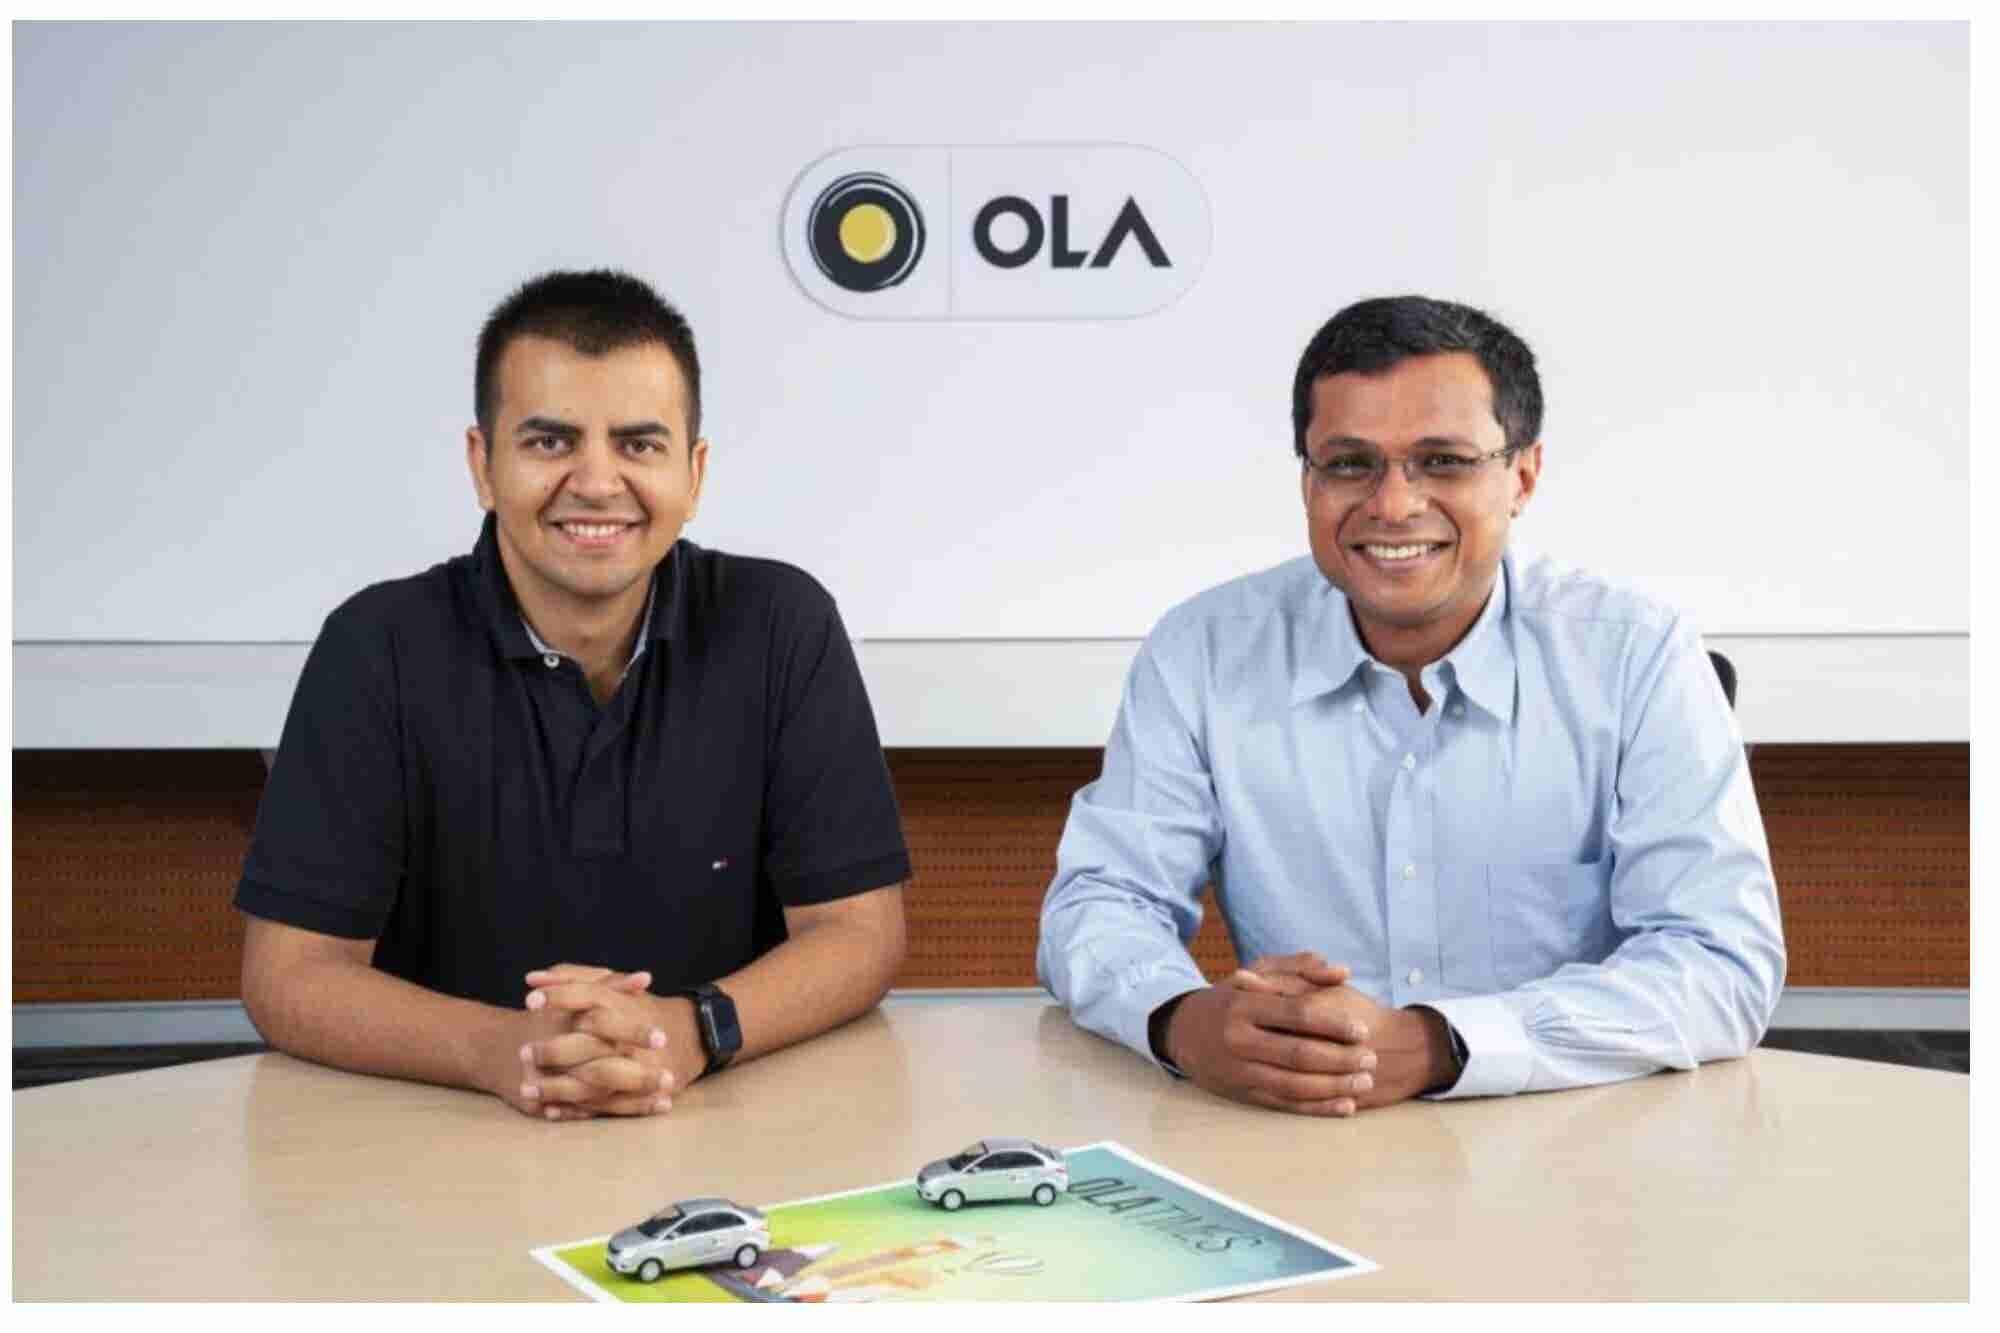 Ola Raises INR 650 Cr from Flipkart Co-founder Sachin Bansal